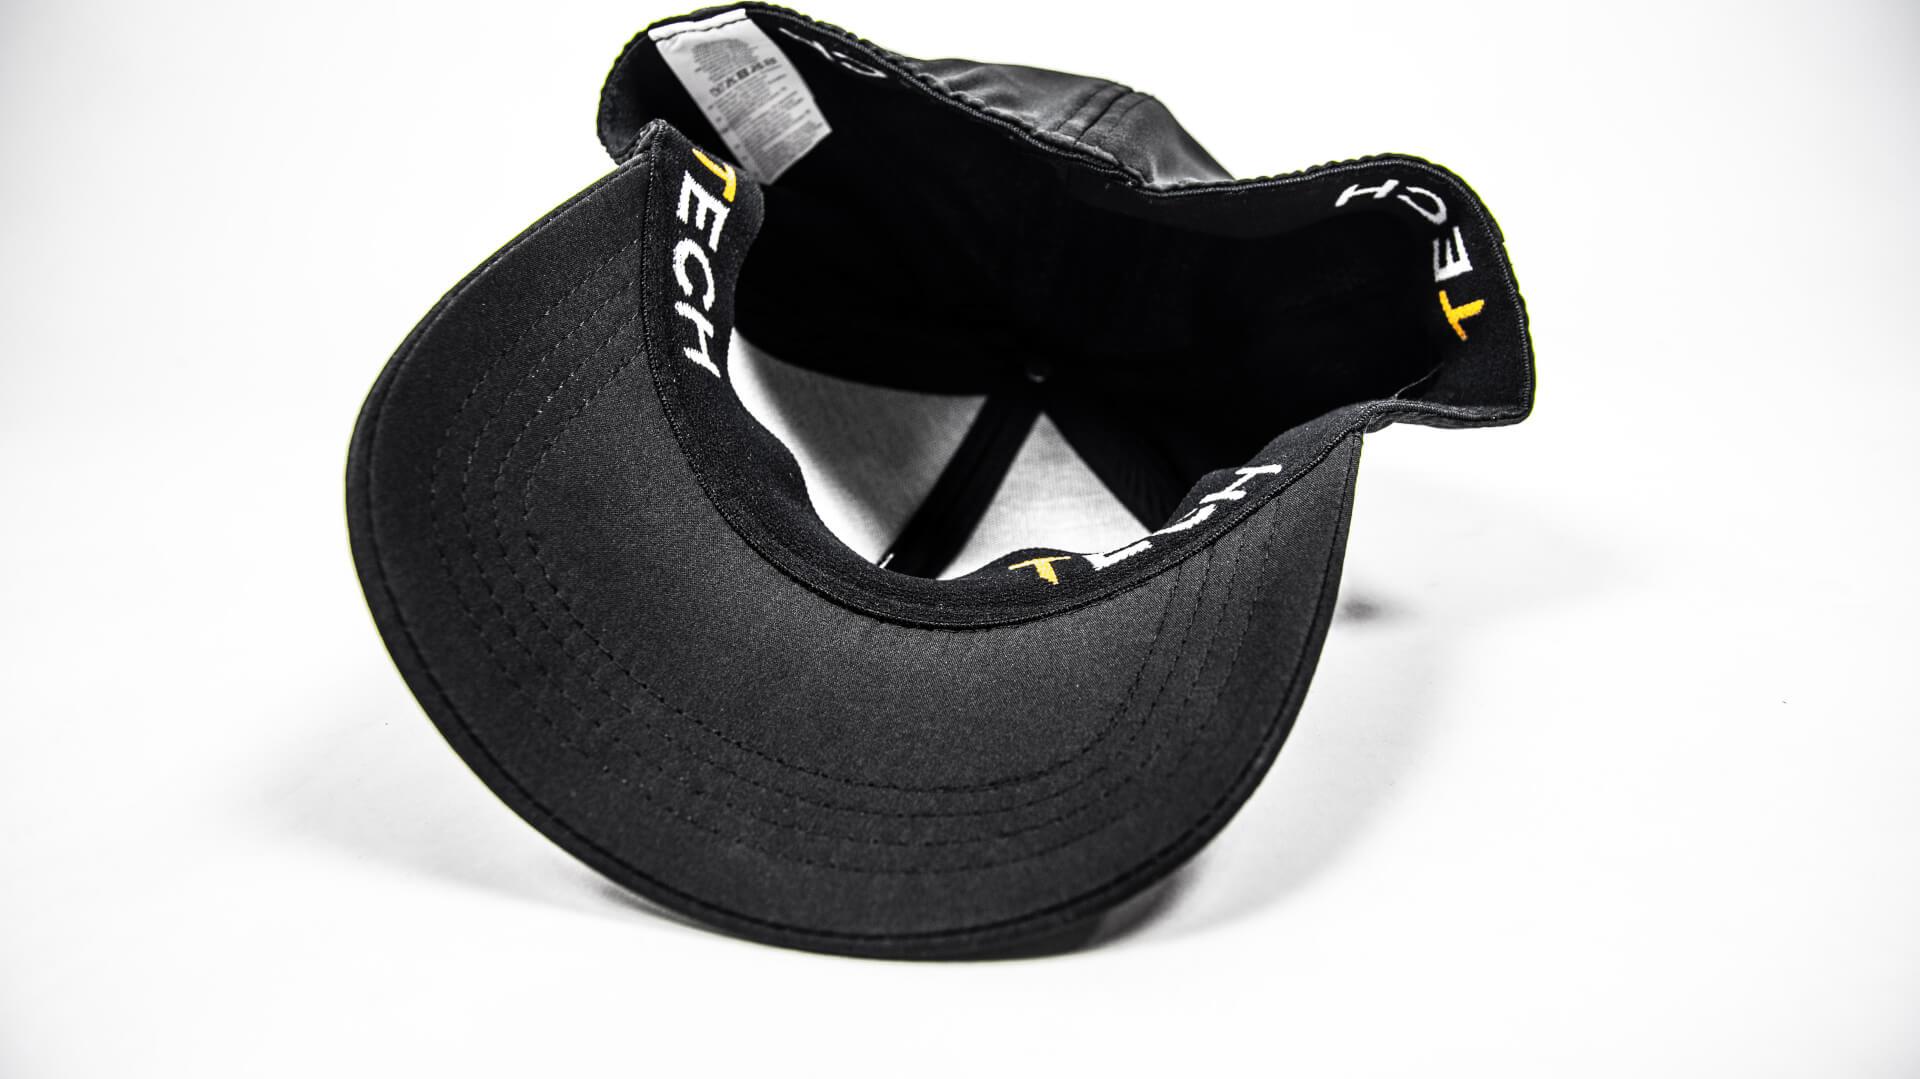 FEFLOGX Sportswear Basic Kappe Pure Sport, Unten-Ansicht.